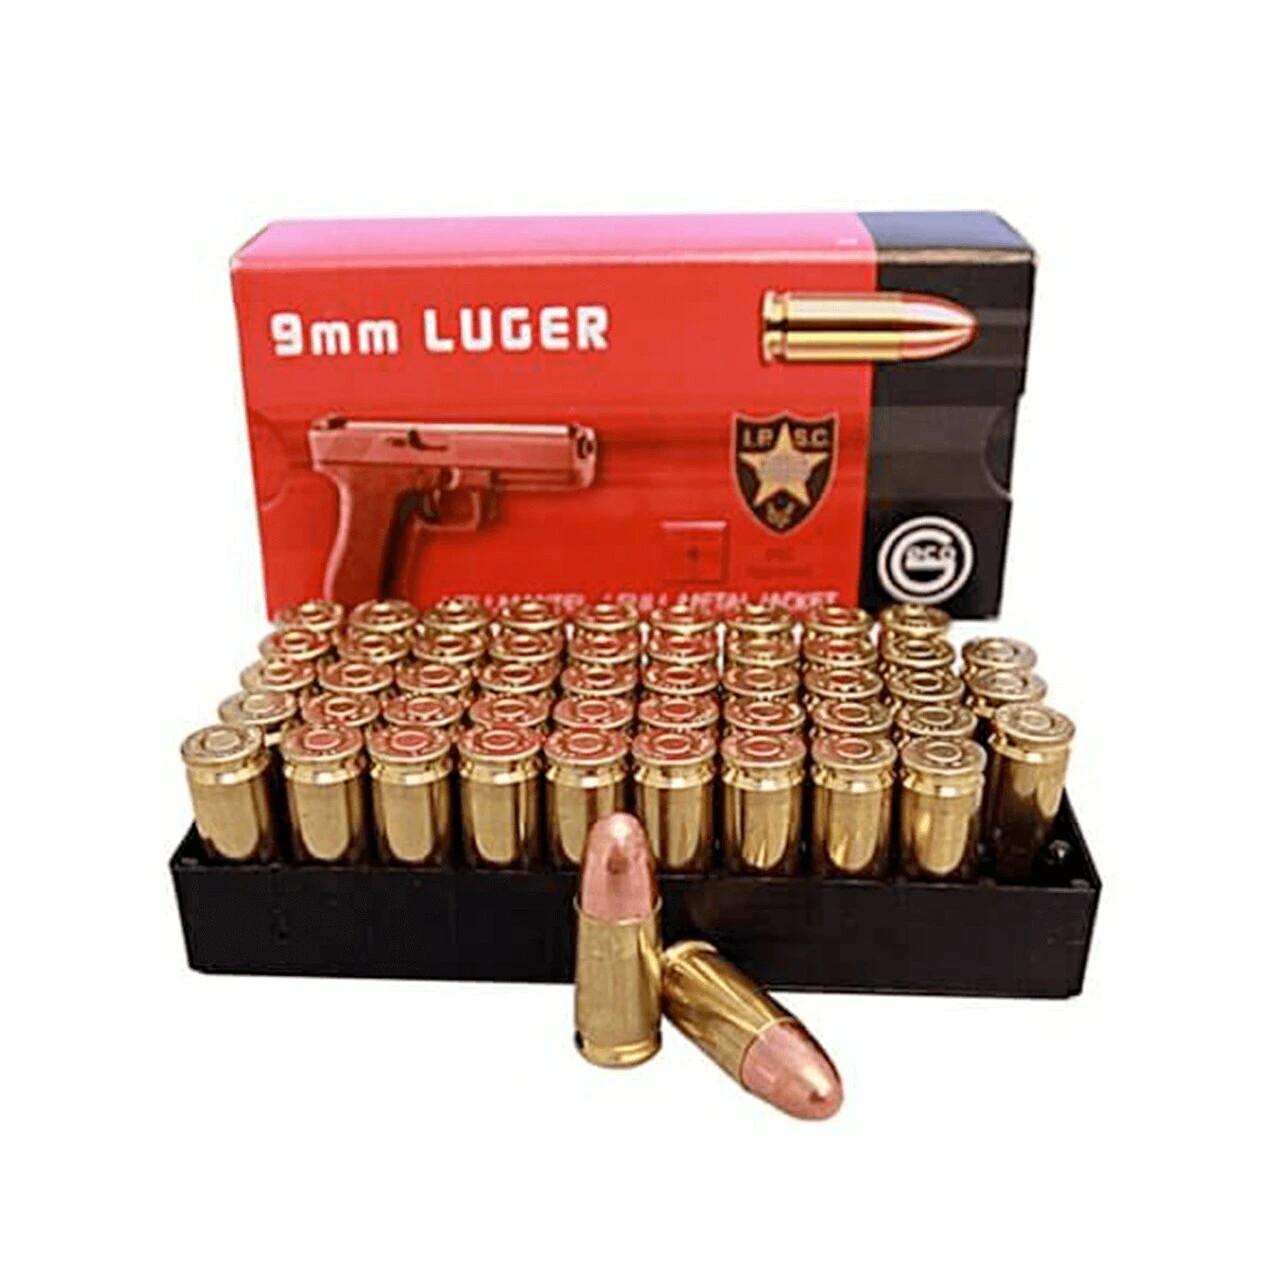 GECO 9mm 124gr Target FMJ RN 50rd Box